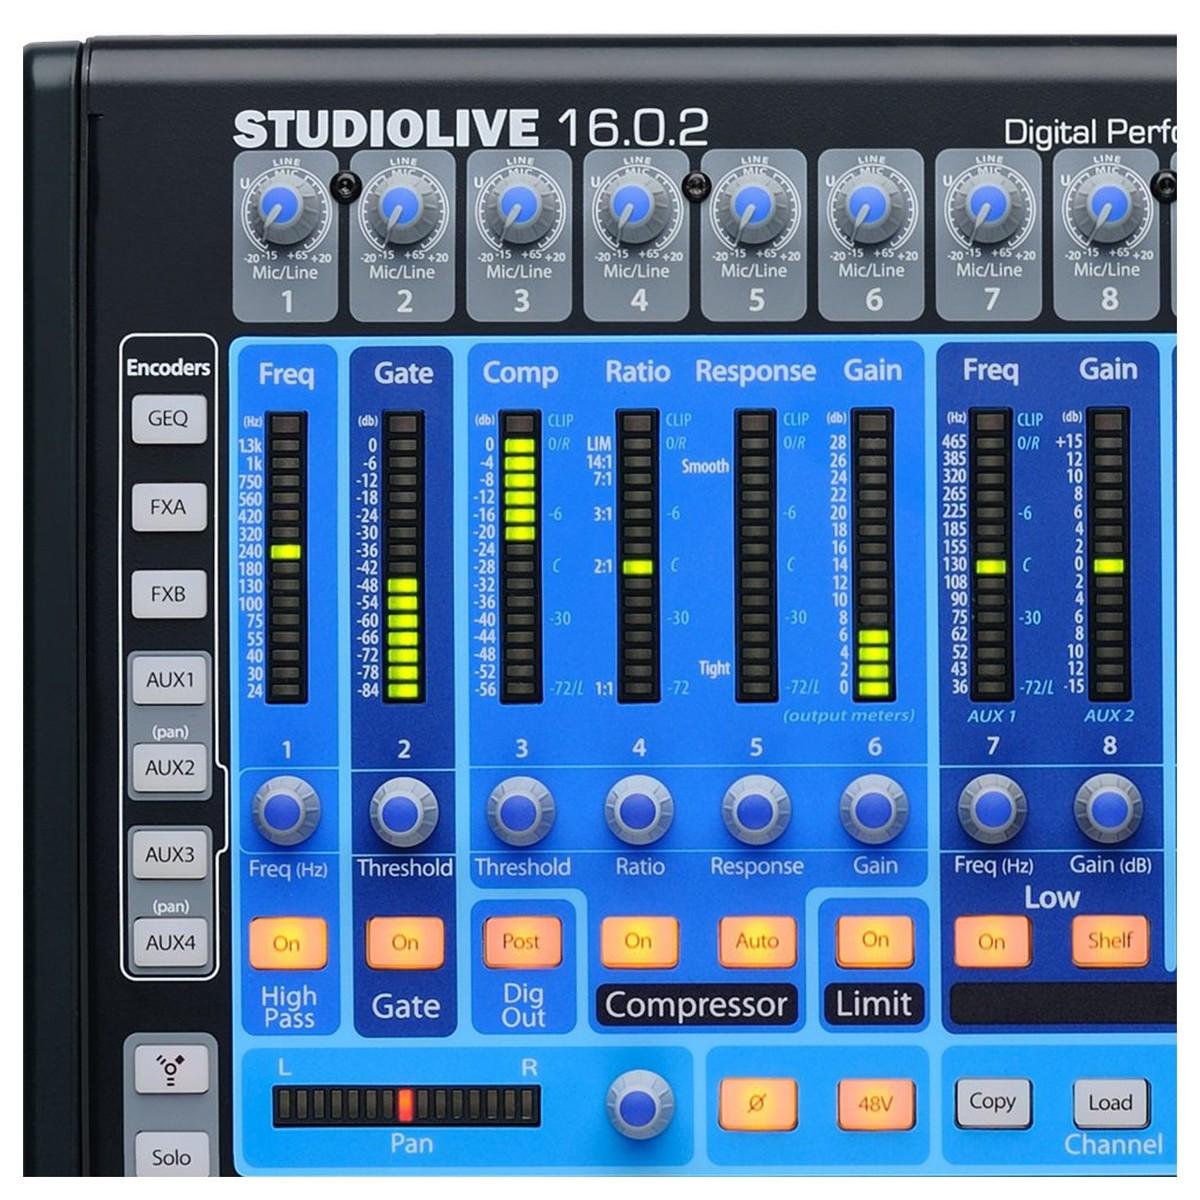 STUDIOLIVE 16.0.2 WINDOWS 7 X64 DRIVER